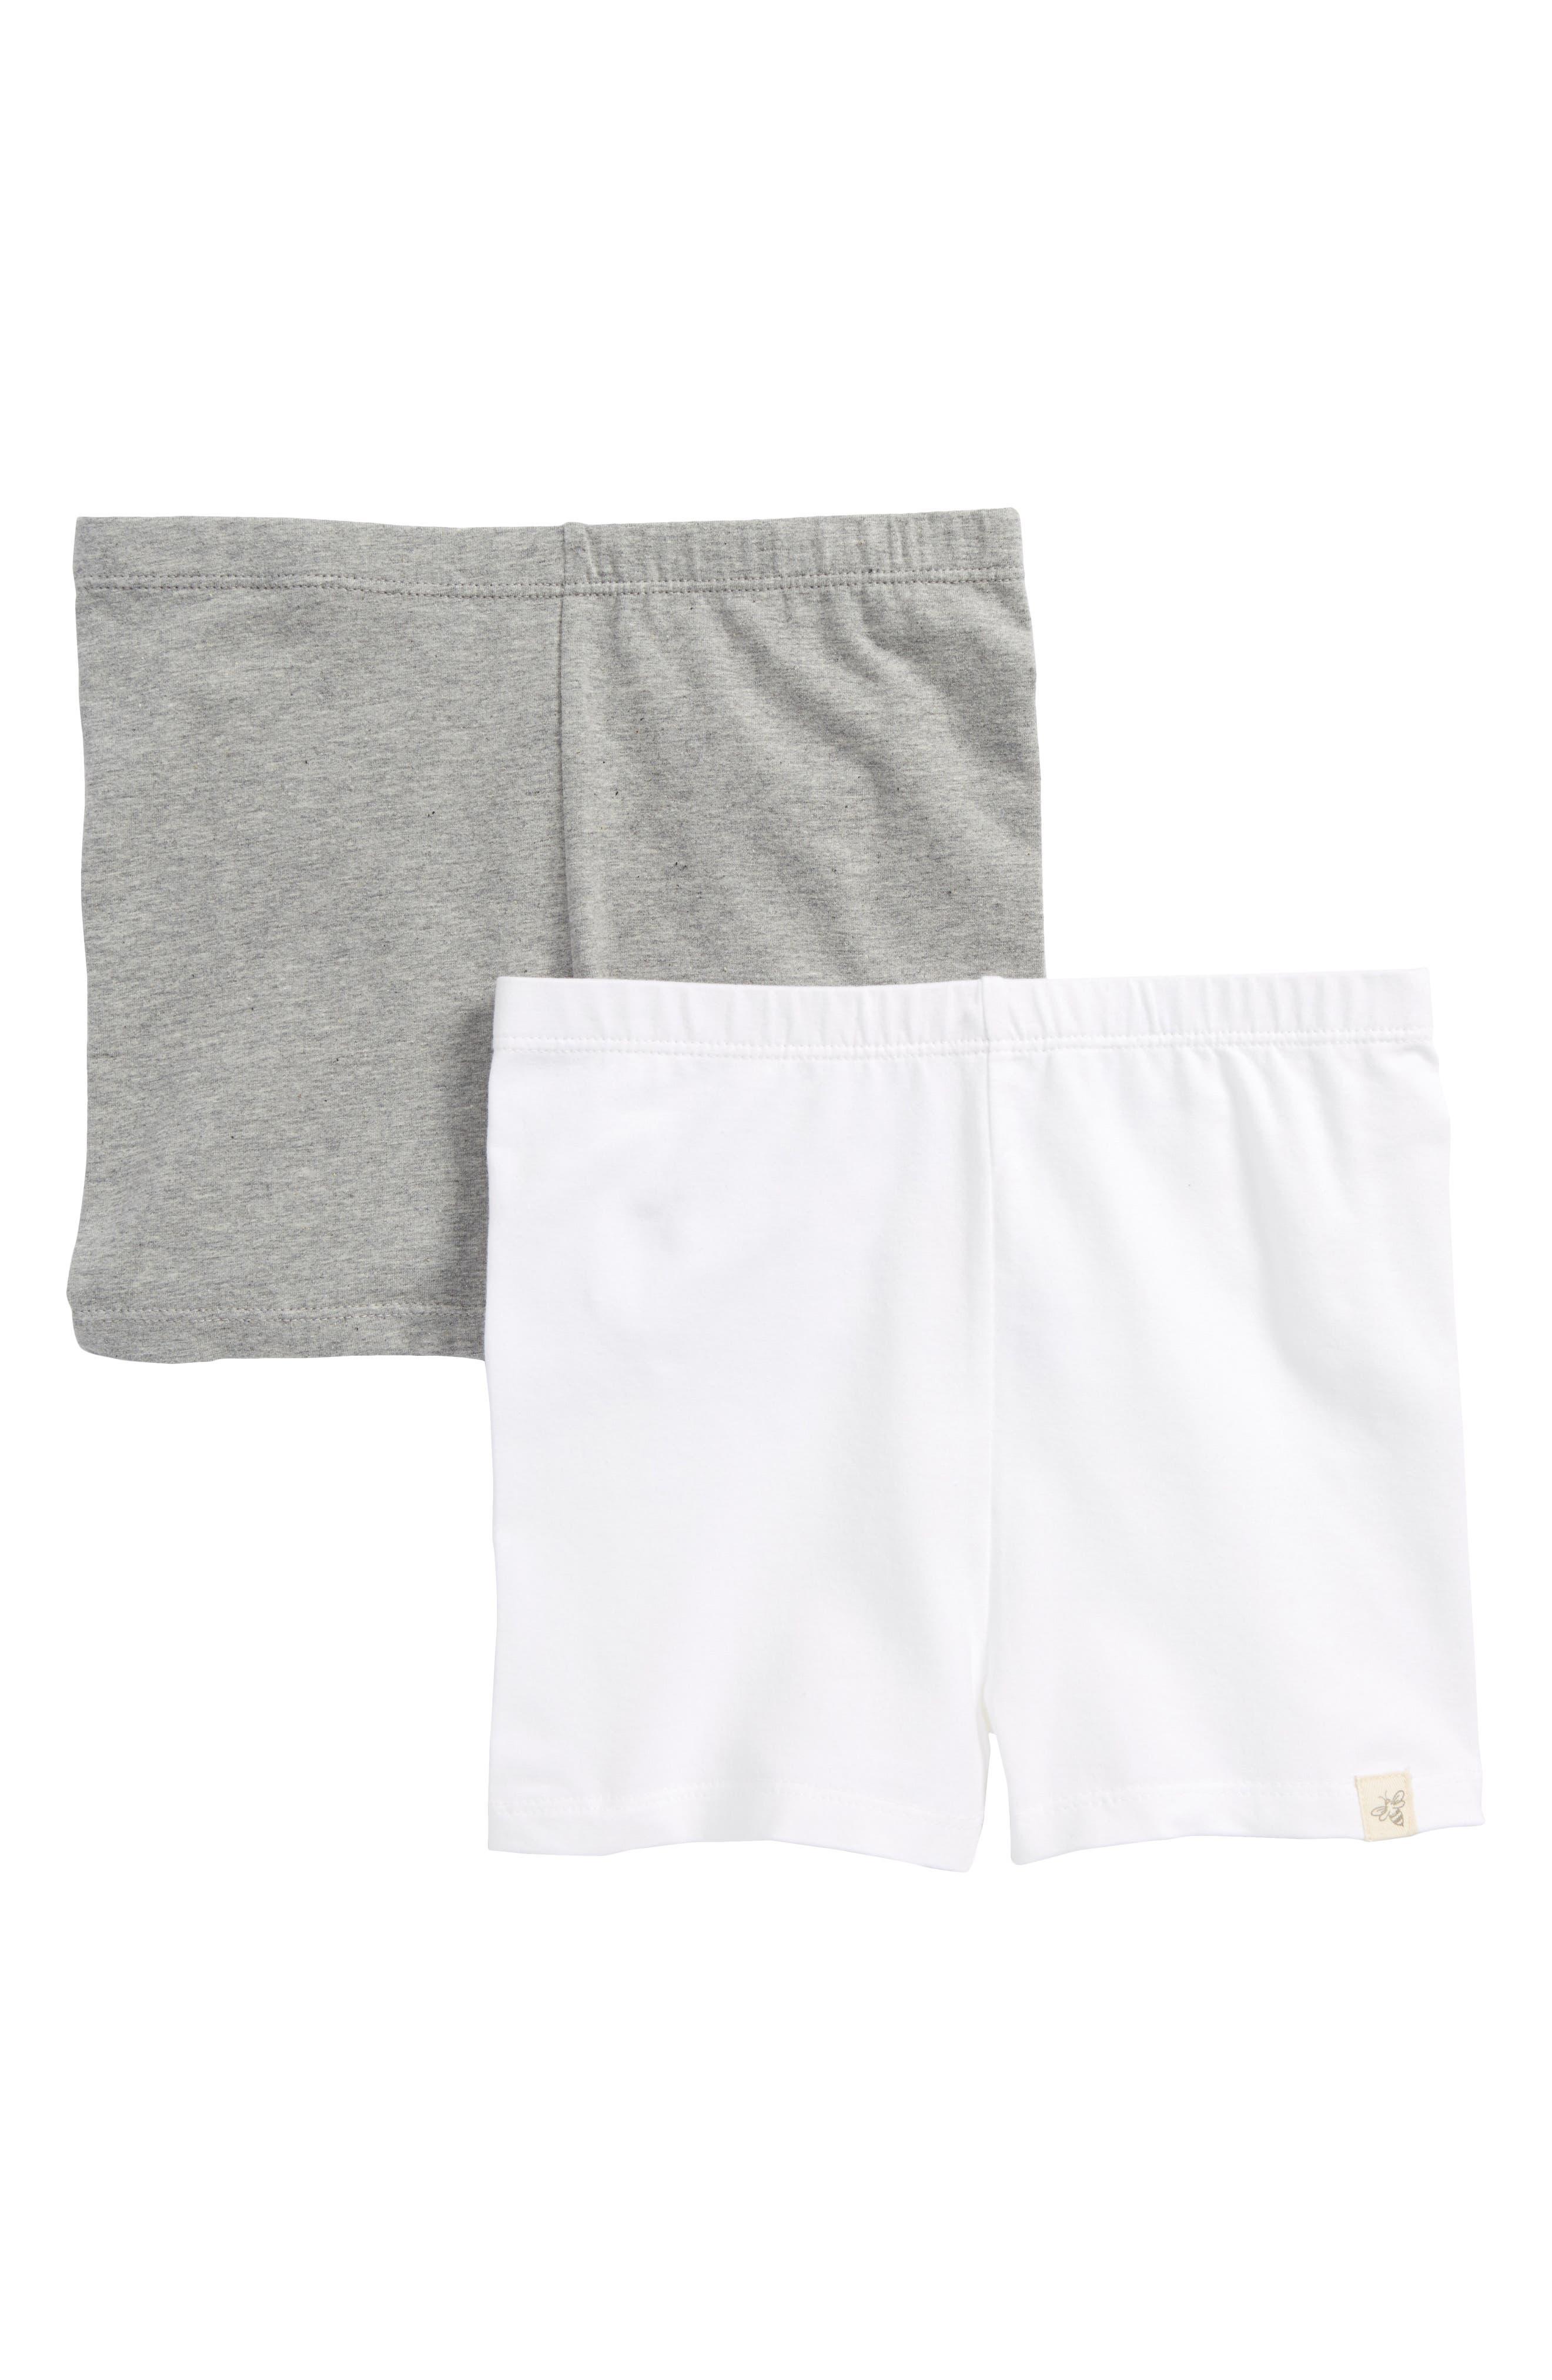 Burt's Bees Baby 2-Pack Organic Cotton Blend Bike Shorts (Toddler Girls & Little Girls)